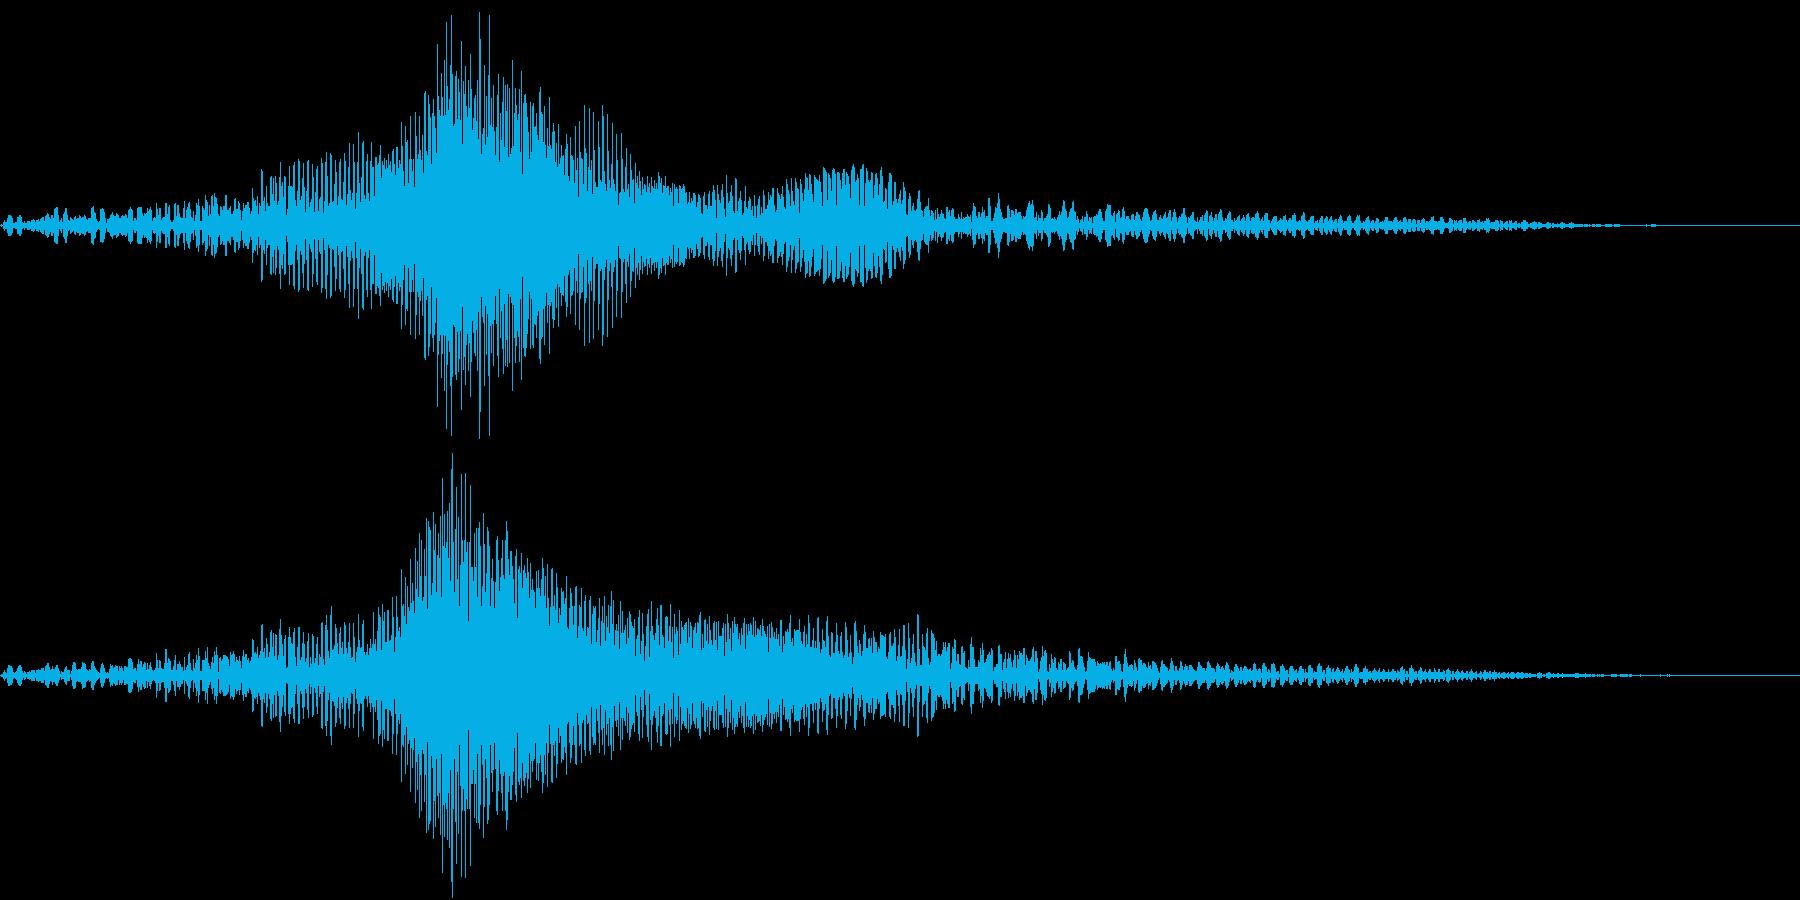 Saber ライトセイバー風 SE 2の再生済みの波形